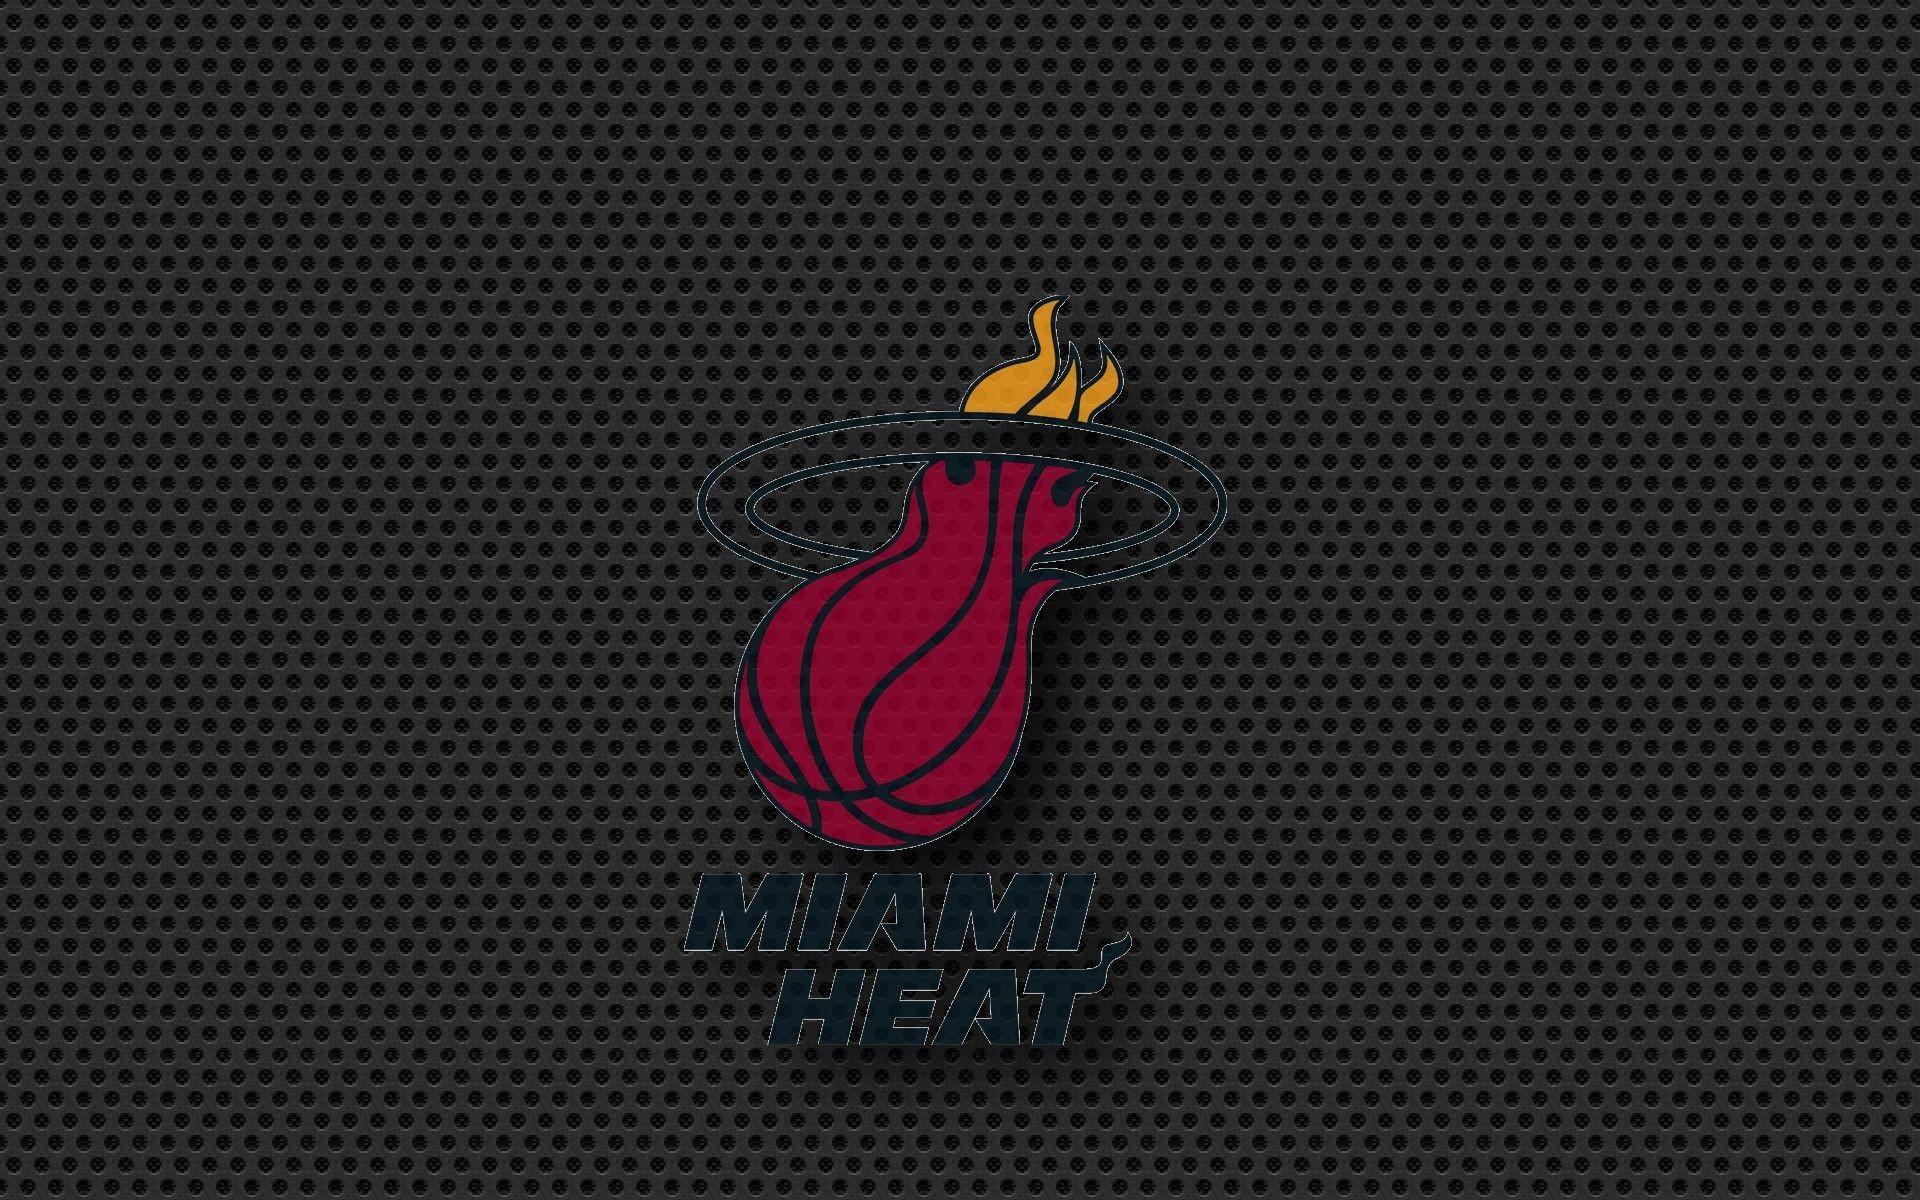 Miami heat logo wallpaper 2018 wallpapertag - Miami heat wallpaper android download ...